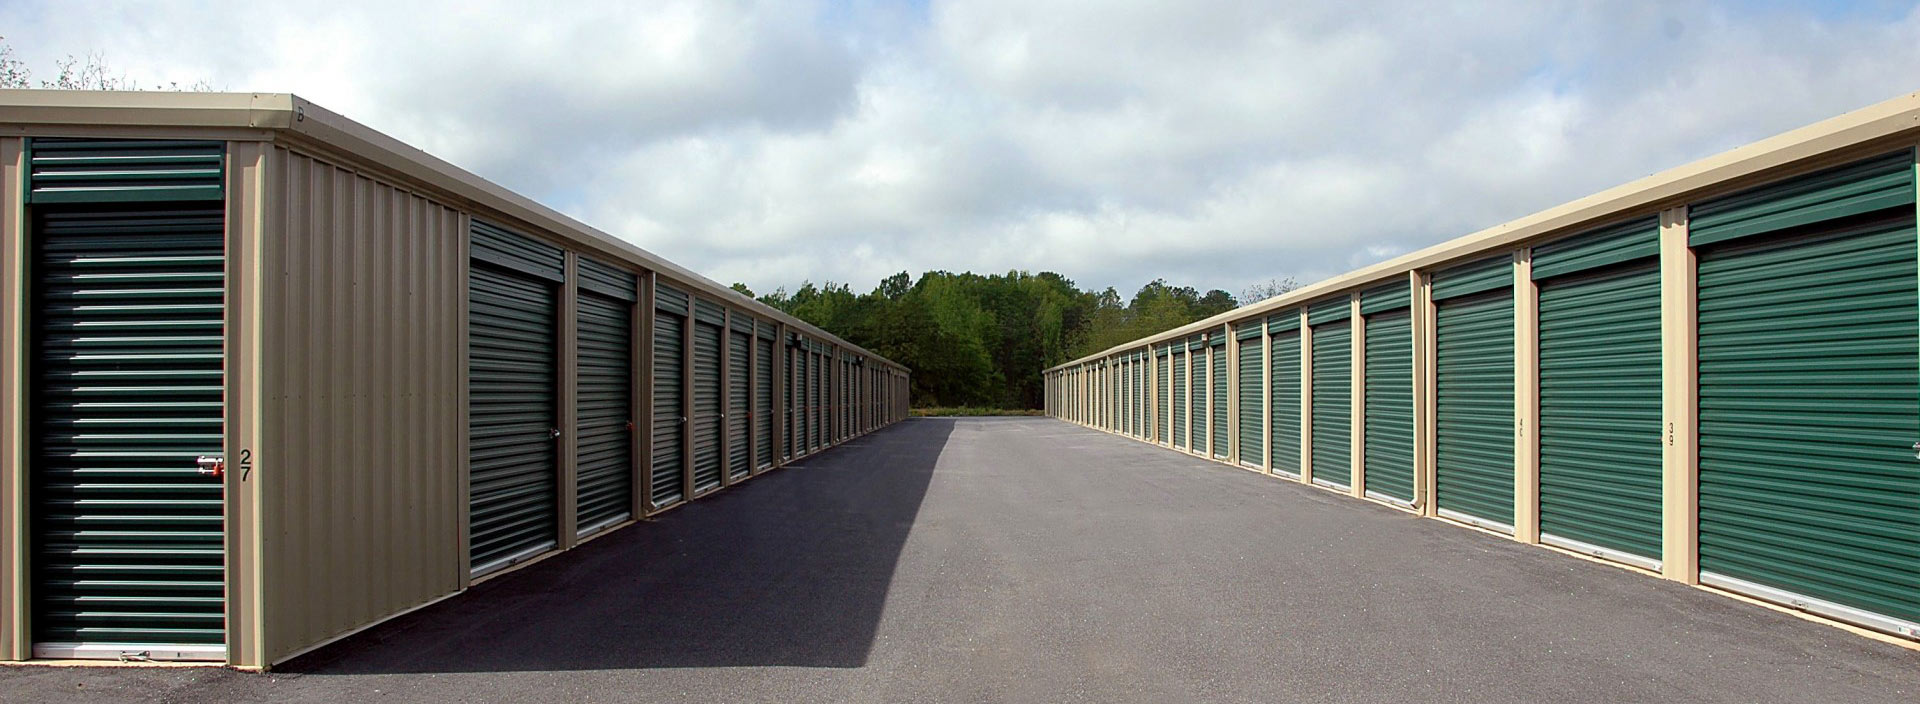 storage-warehouse-facility-hanwell-road-fredericton-new-brunswick